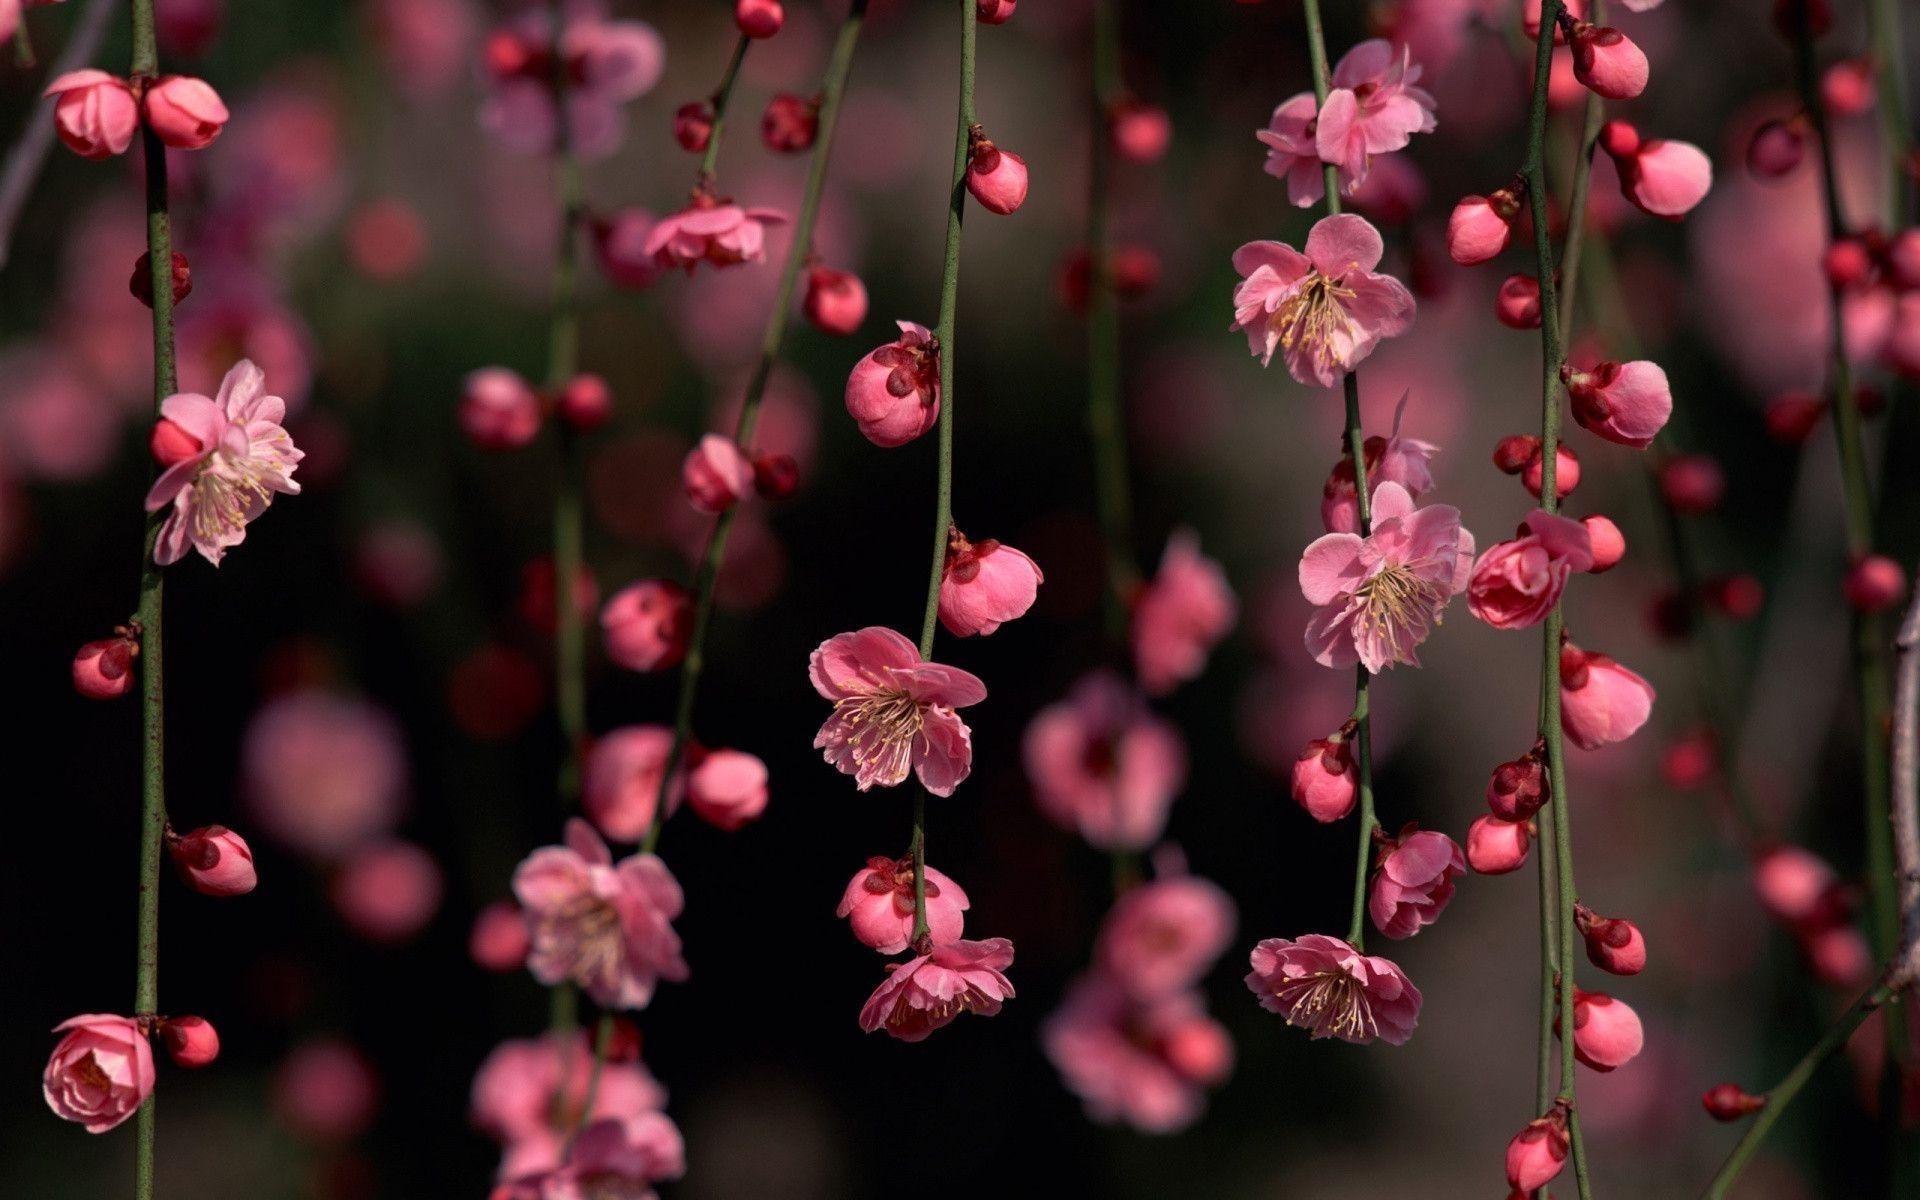 Floral Aesthetic Desktop Wallpapers Wallpaper Cave